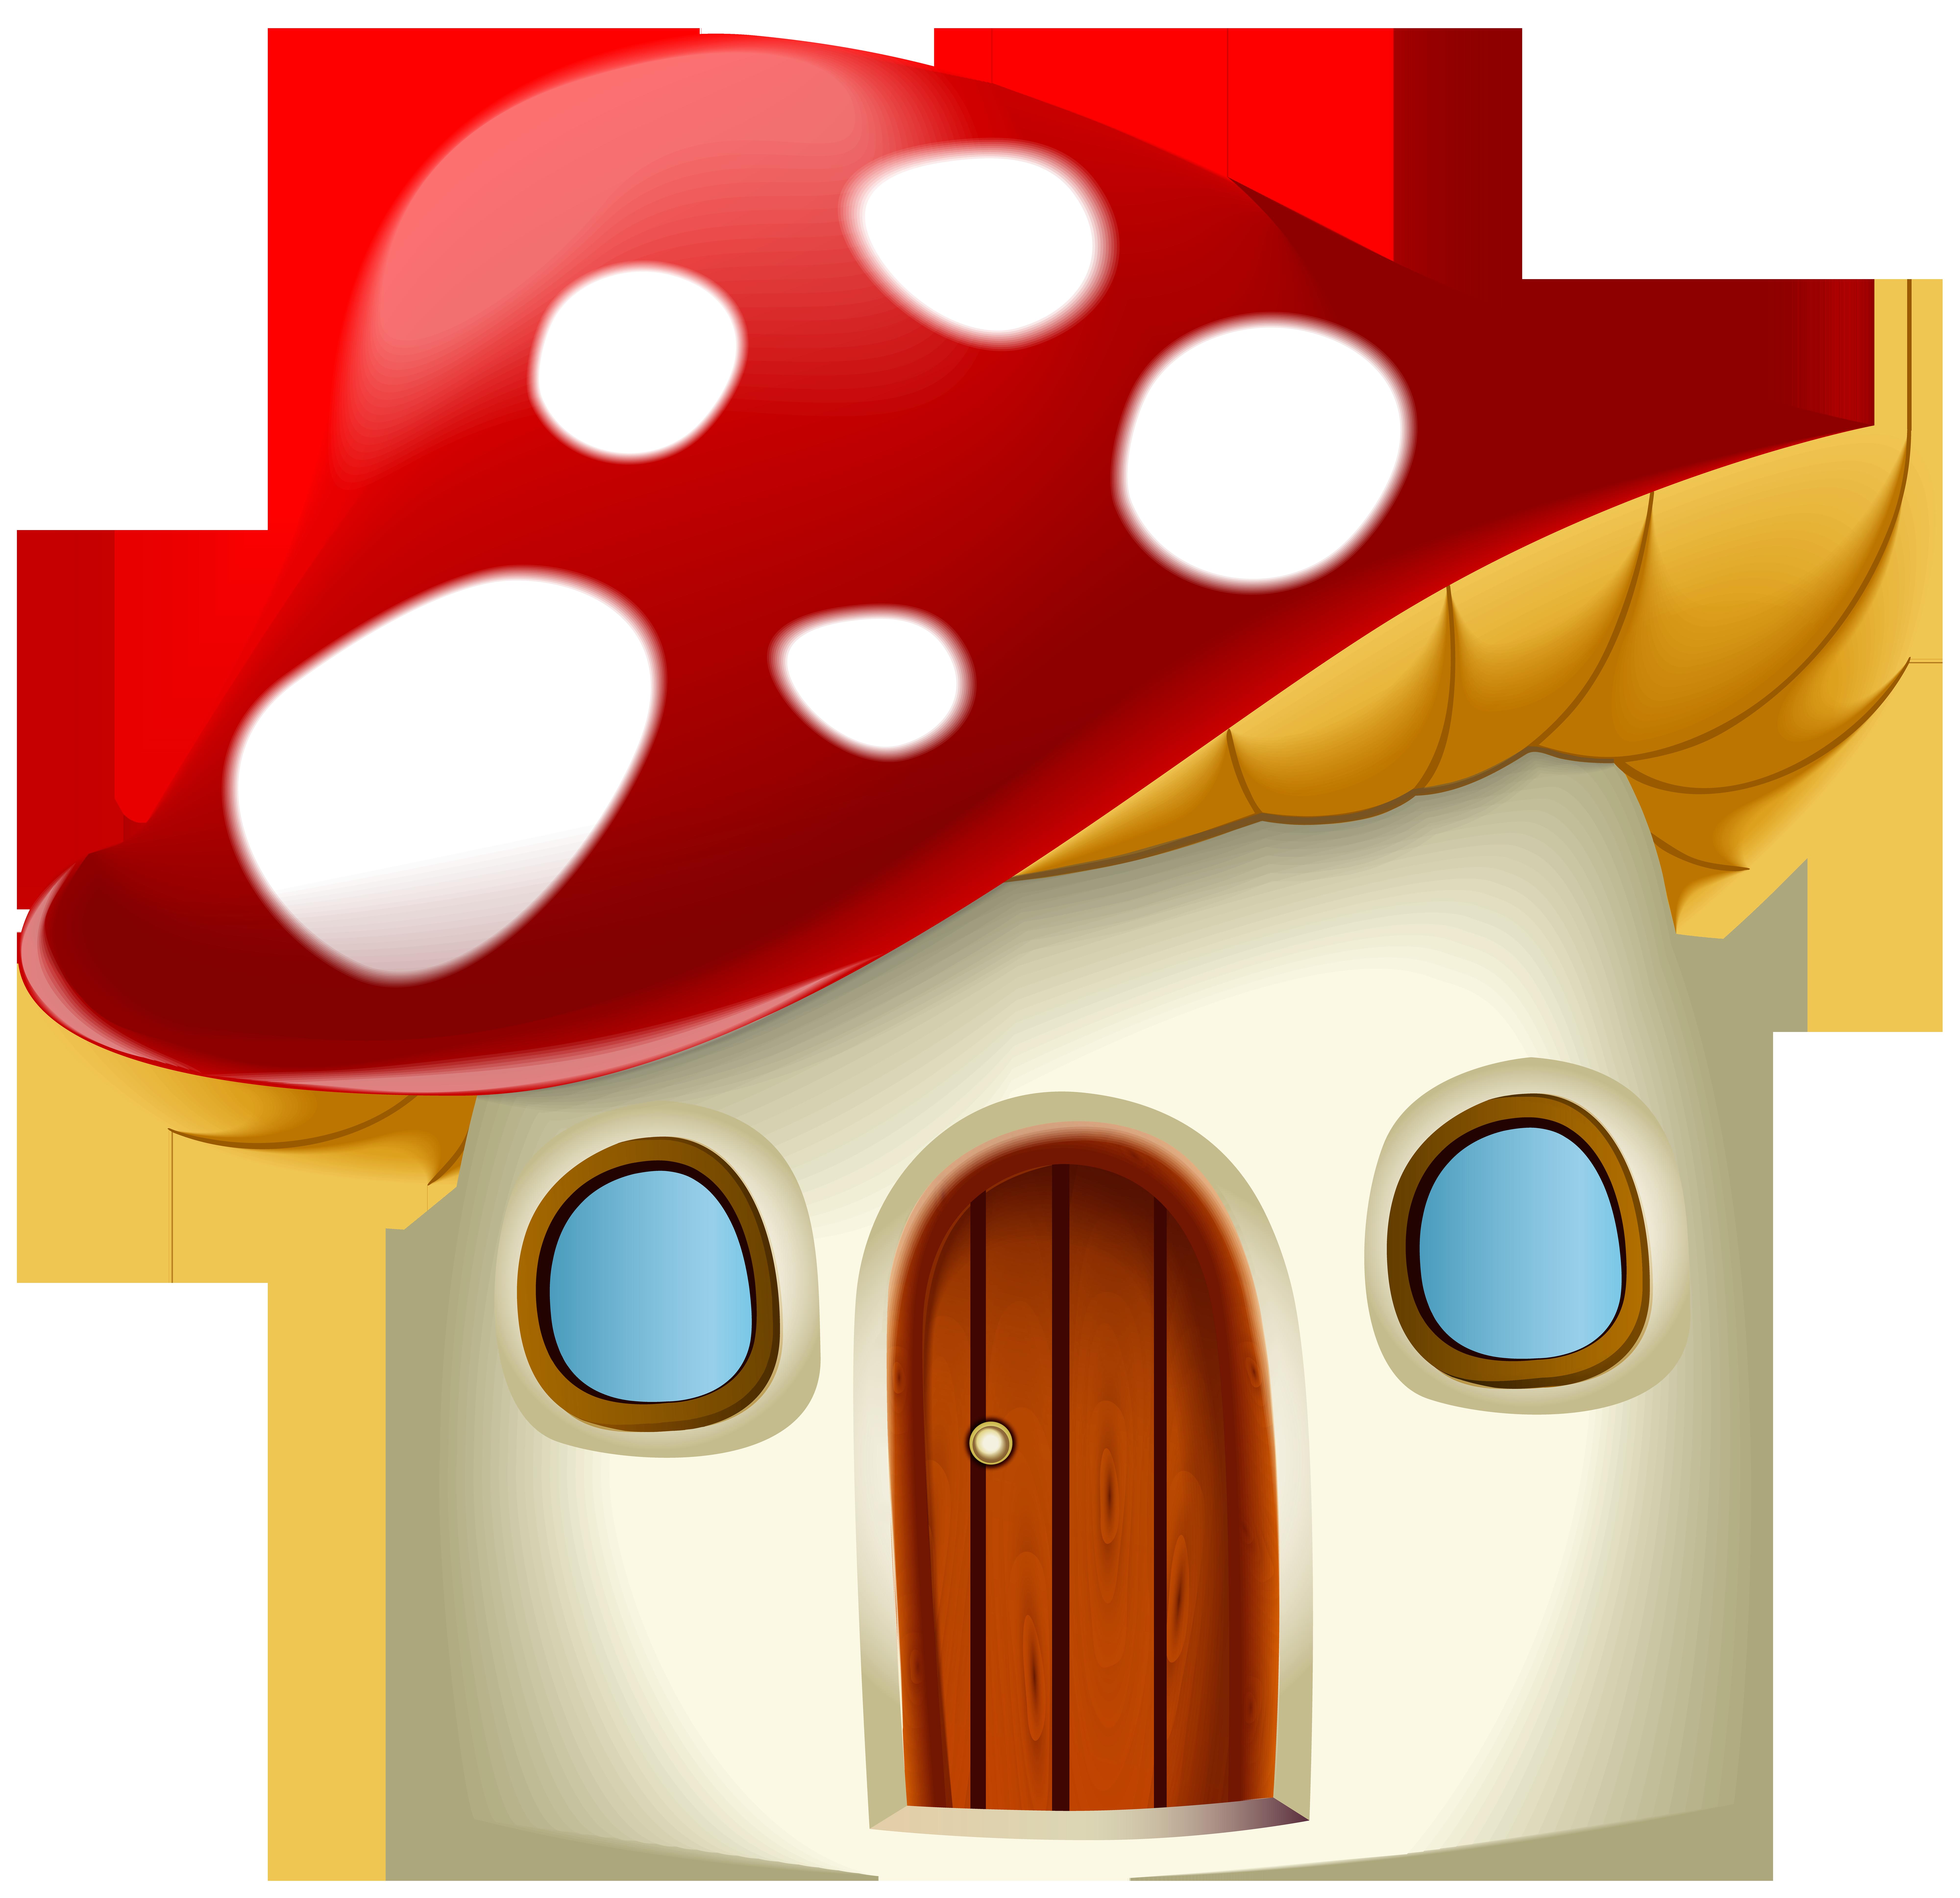 Mushroom gallery yopriceville high. House cartoon png